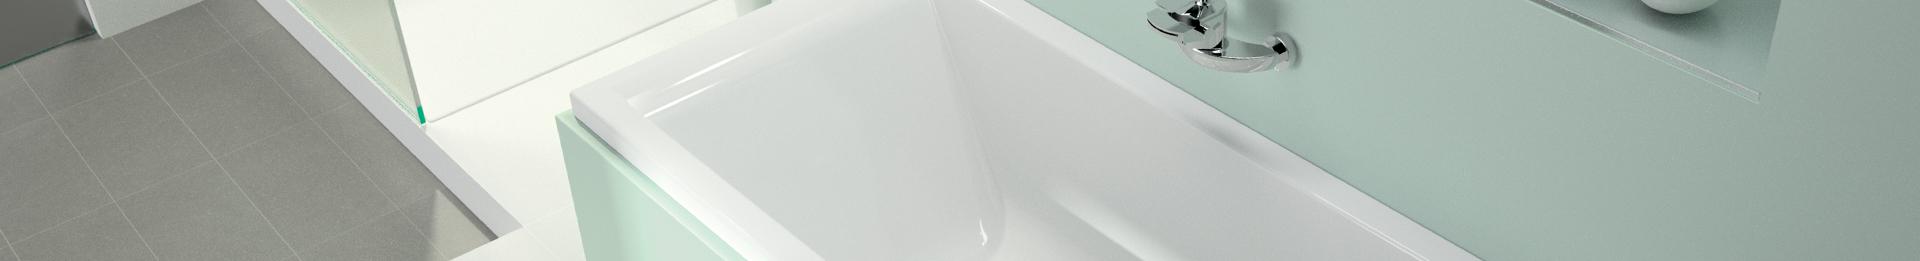 Grande baignoire petite baignoire toutes les collections - Baignoire grande ...